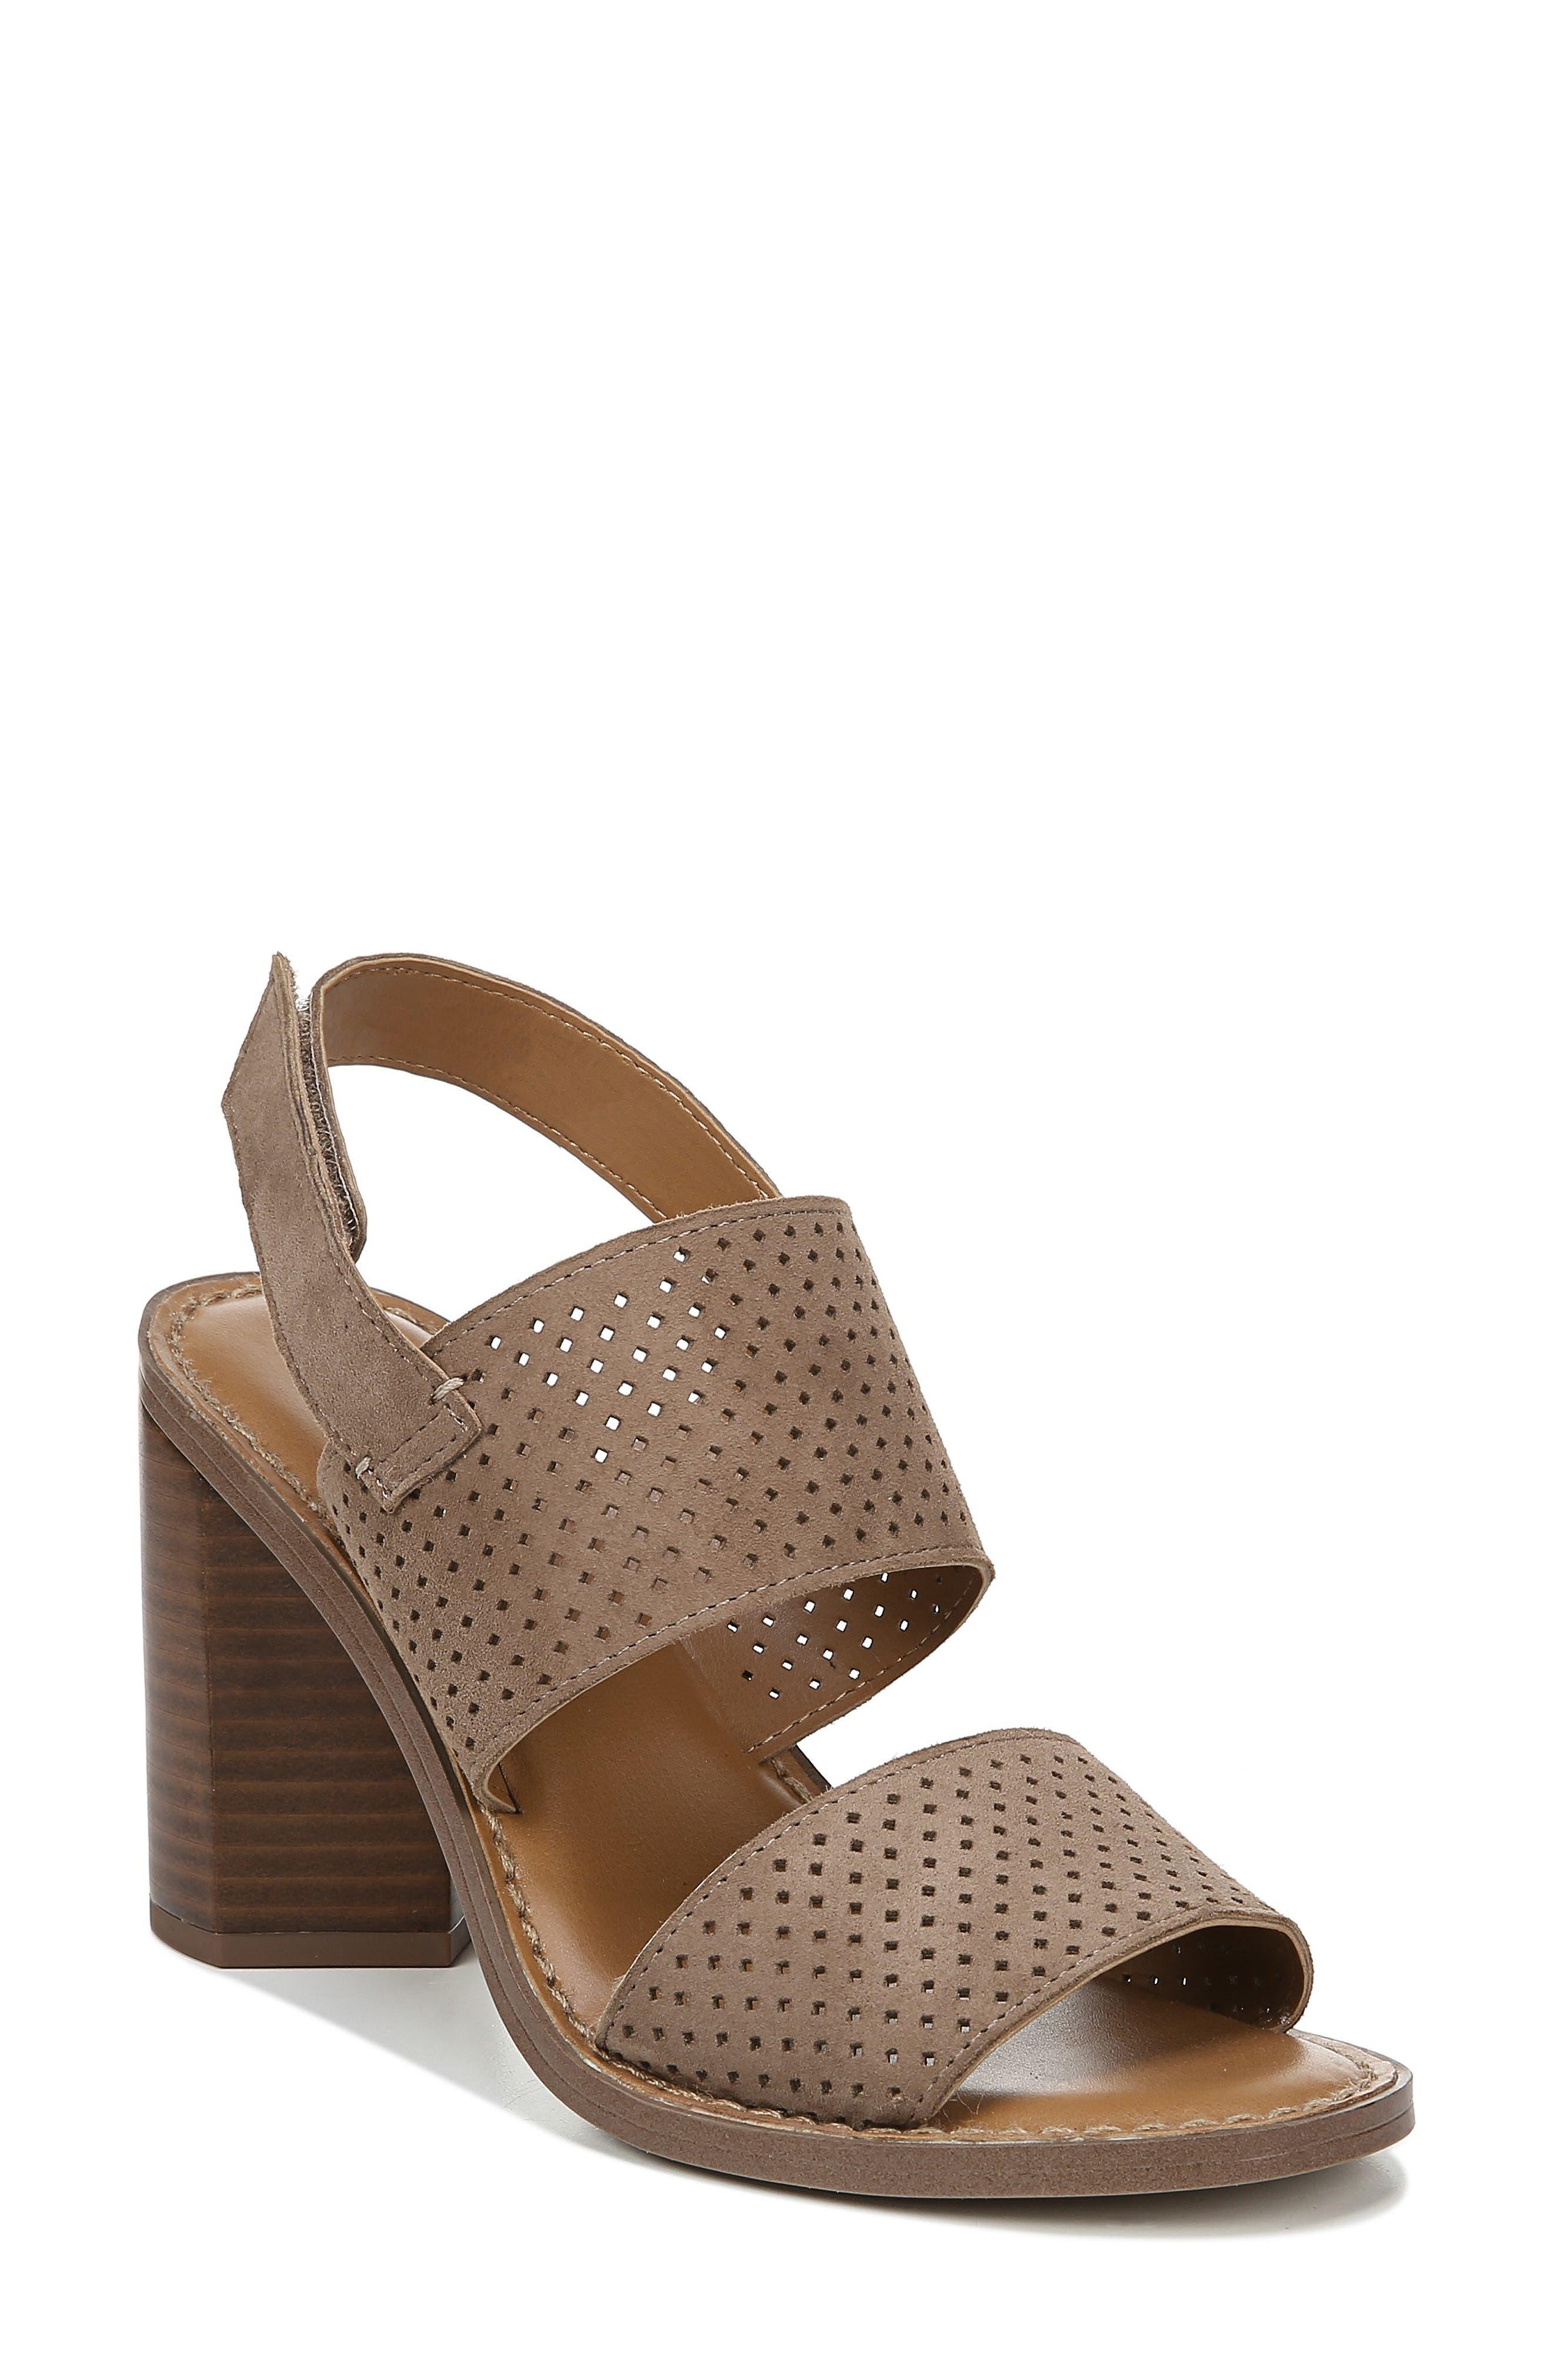 Franco Sarto Devine Perforated Slingback Sandal, Beige